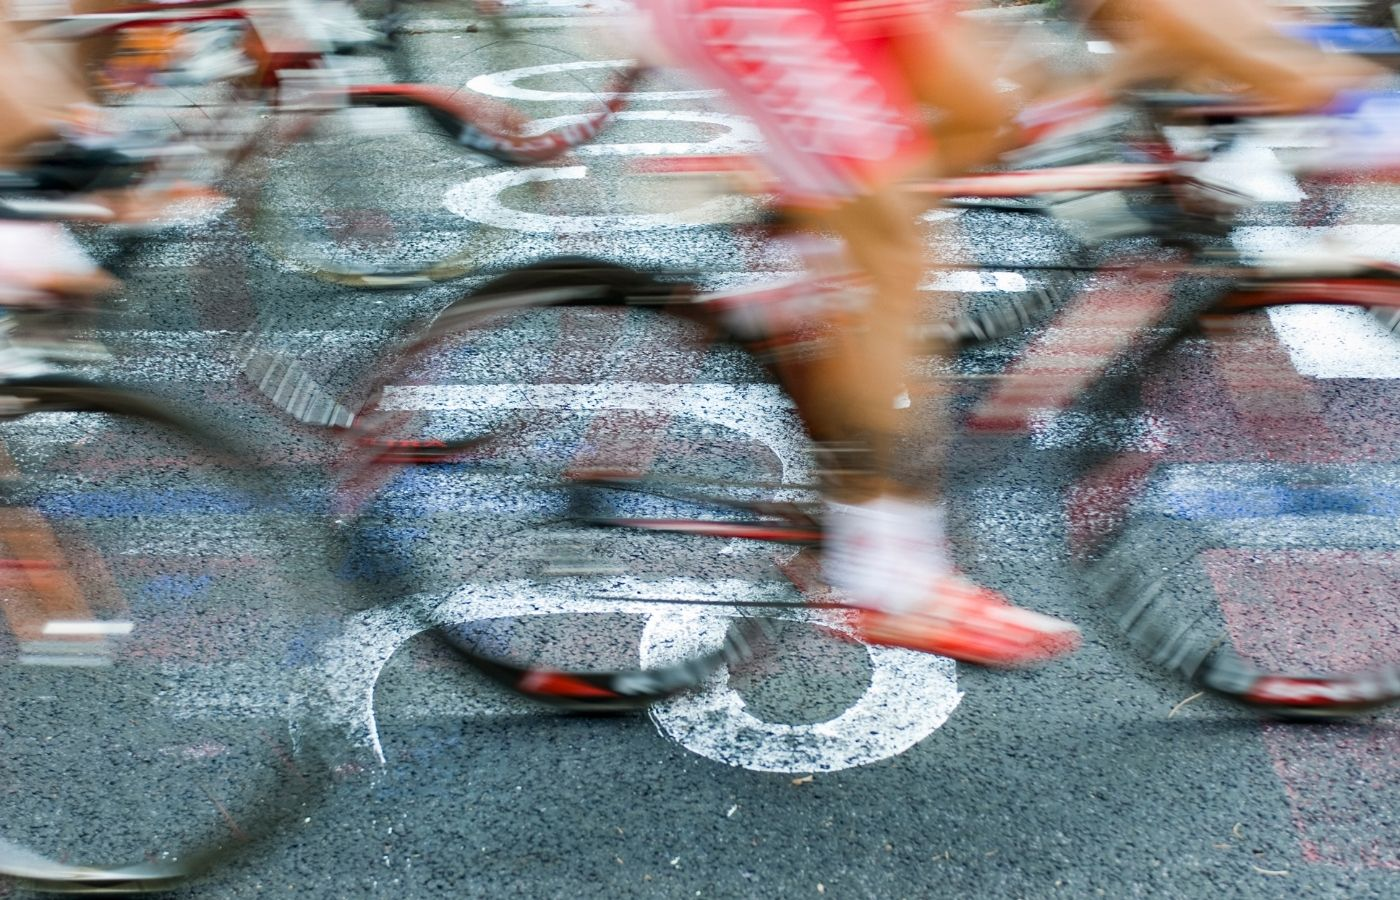 Hokej a cyklistika? Pro Škodovku správná kombinace | Sportbiz